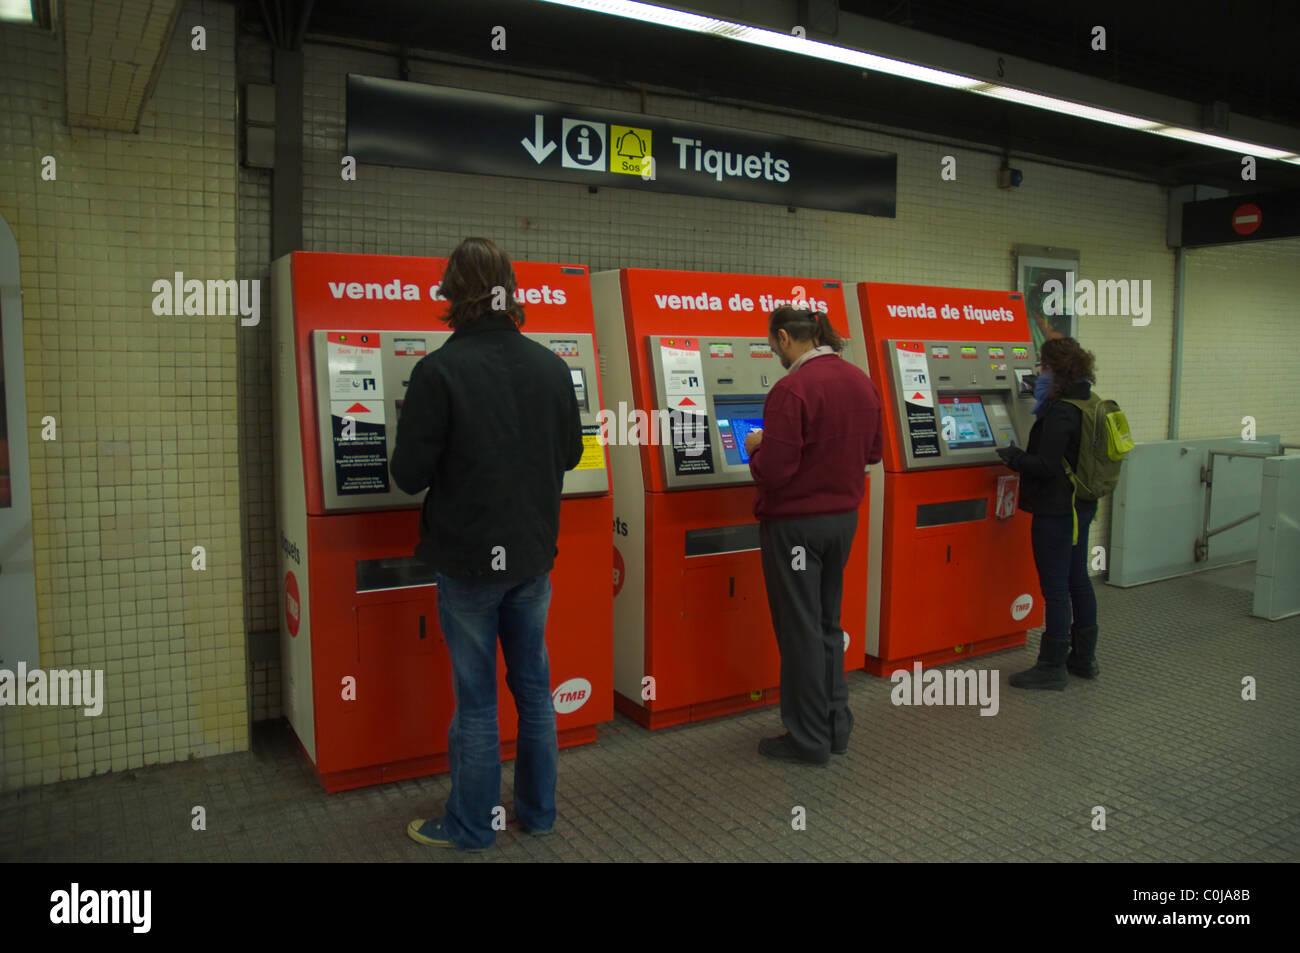 ticket vending machines subway station stockfotos ticket. Black Bedroom Furniture Sets. Home Design Ideas